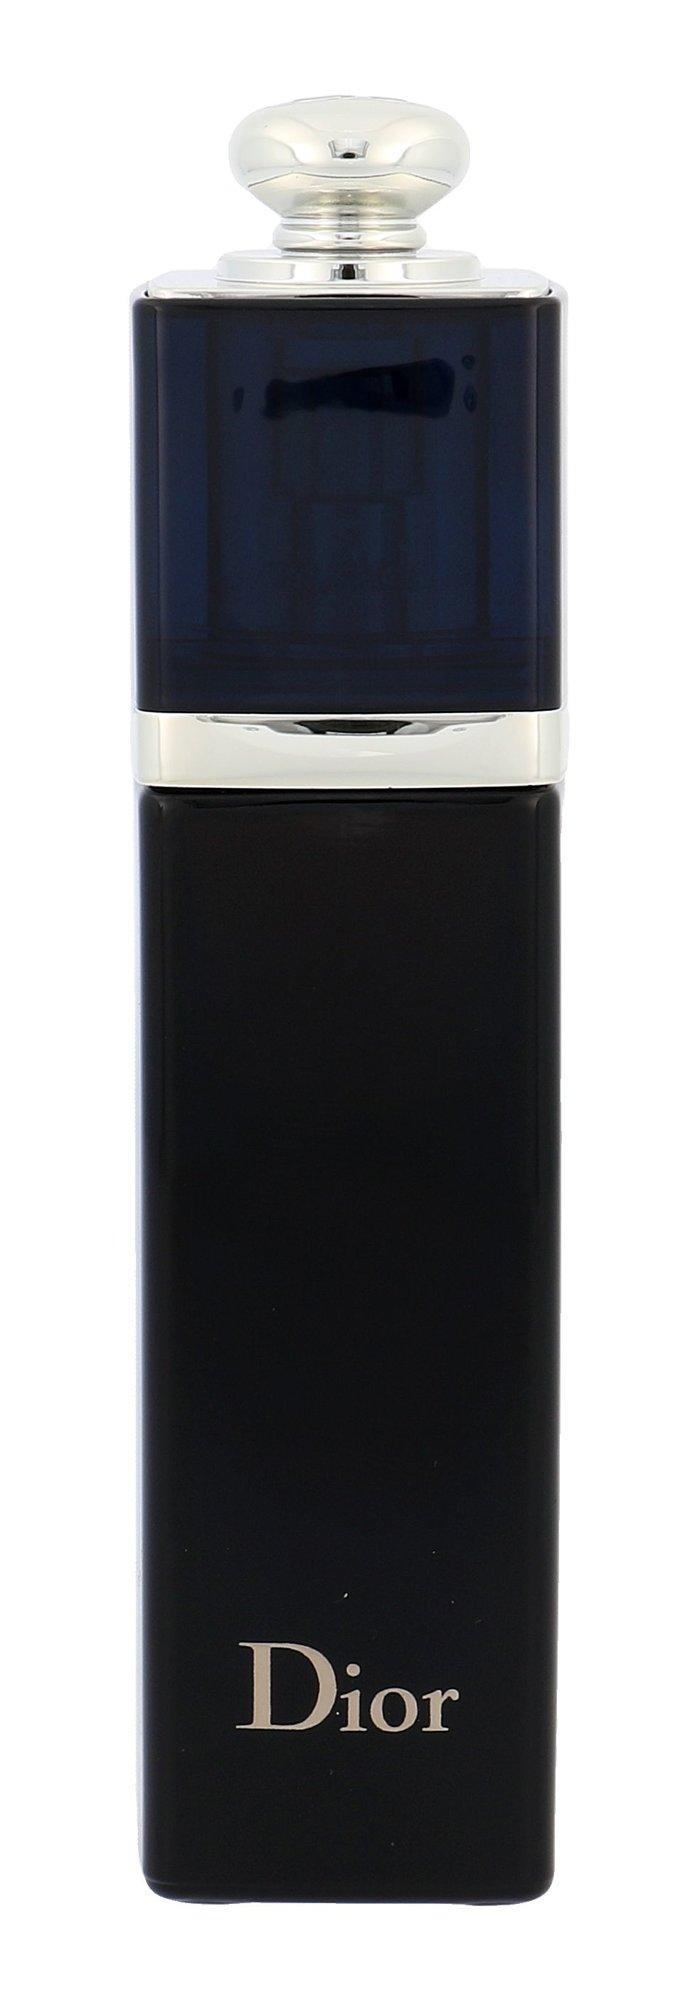 Christian Dior Dior Addict EDP 30ml